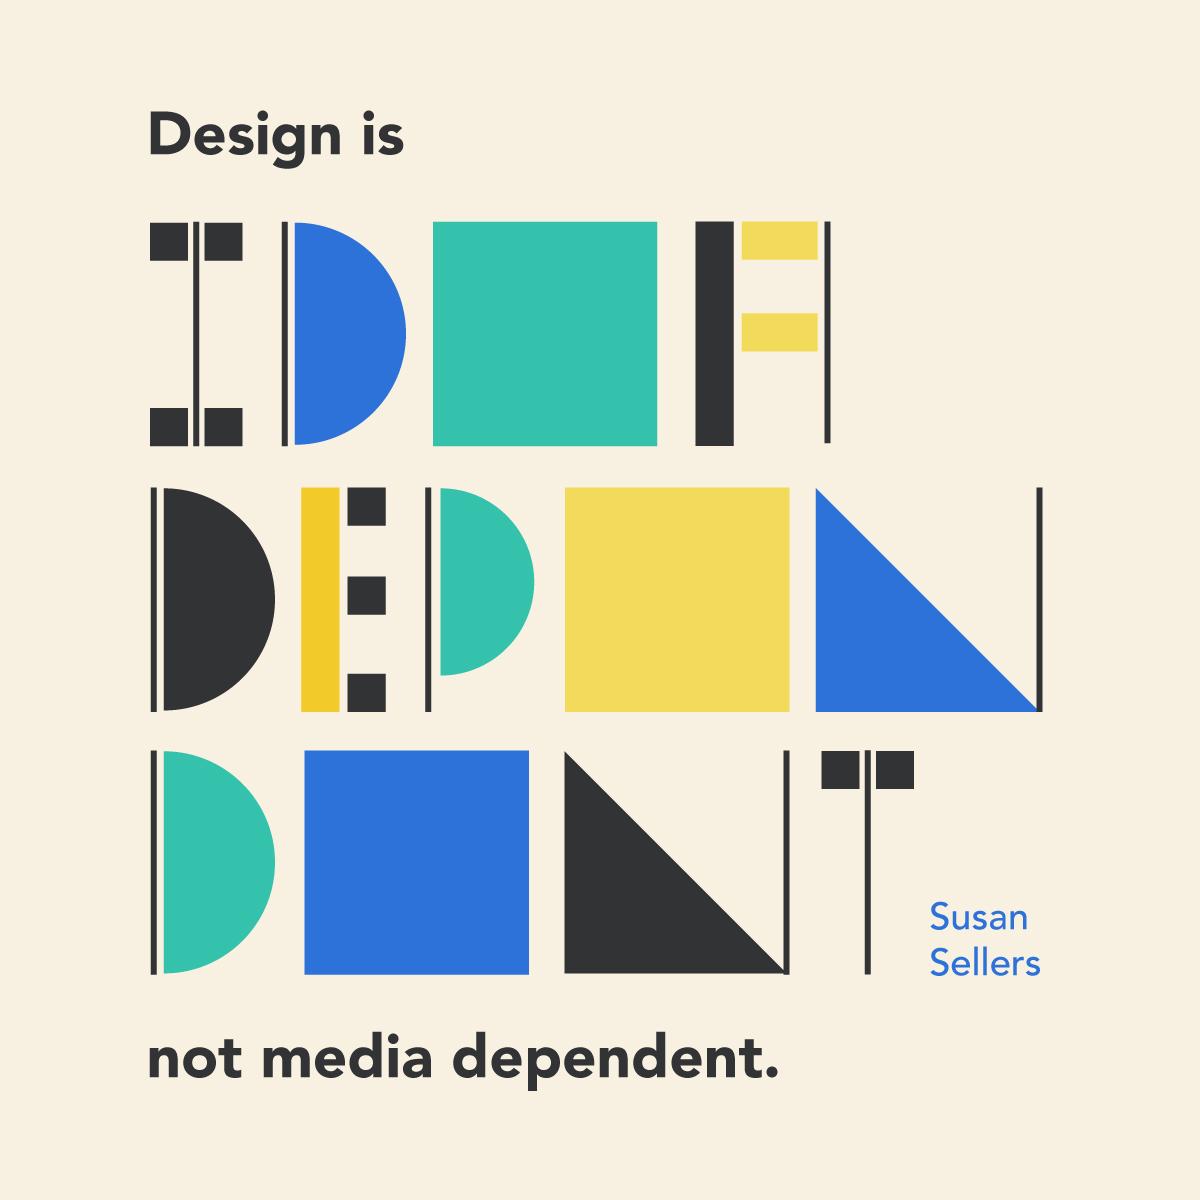 """Design is idea dependent, not media dependent."" Susan Sellers"